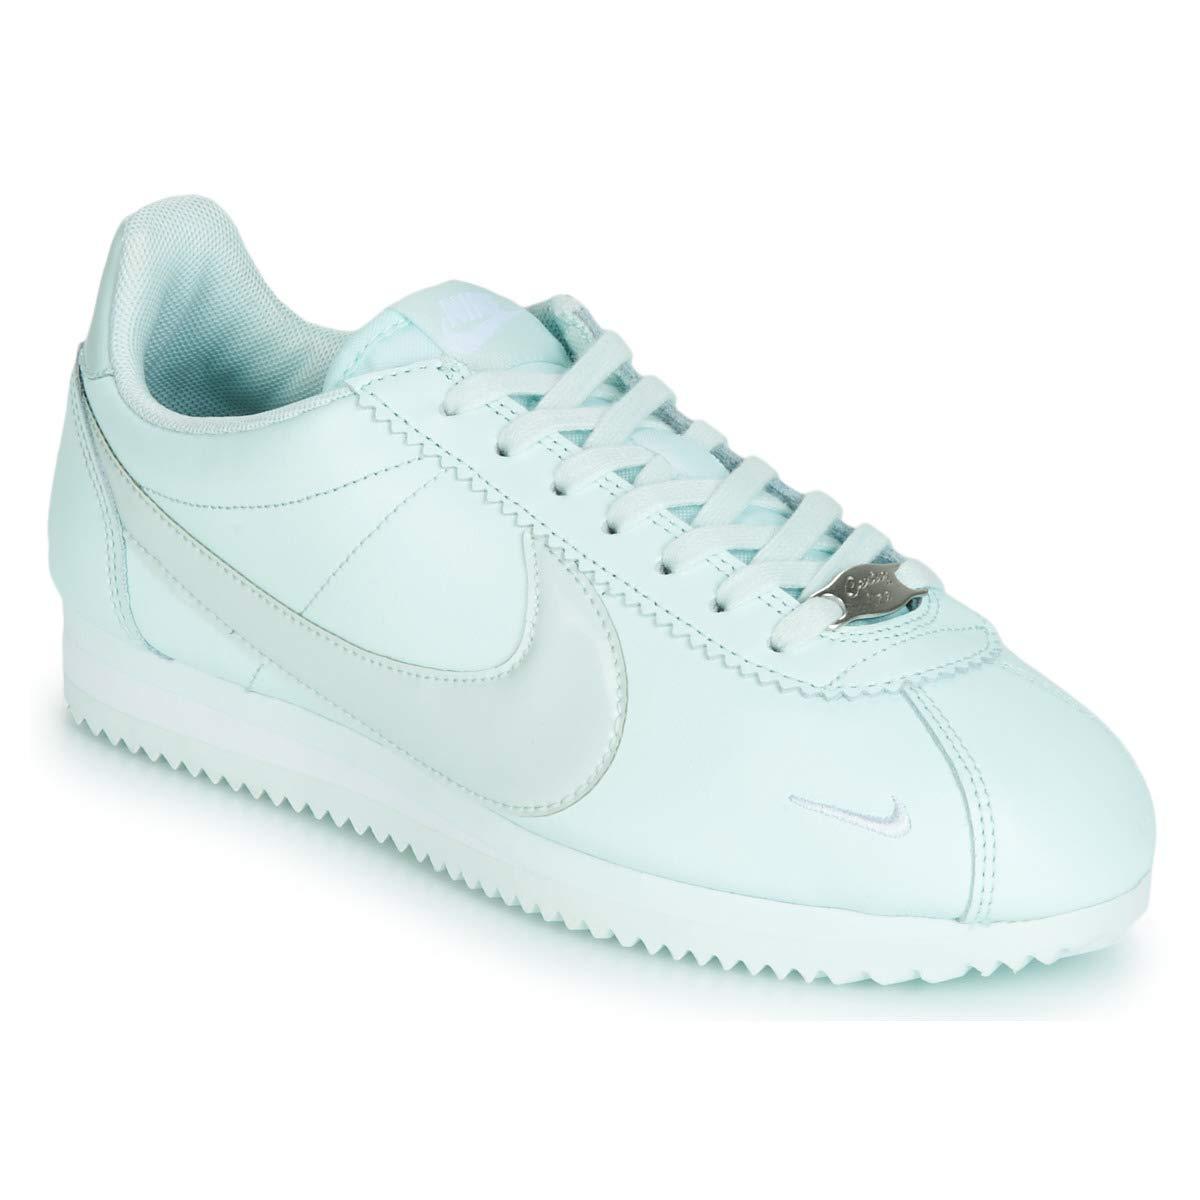 Nike Classic Cortez Premium W Turnschuhe Damen Grau Turnschuhe Low